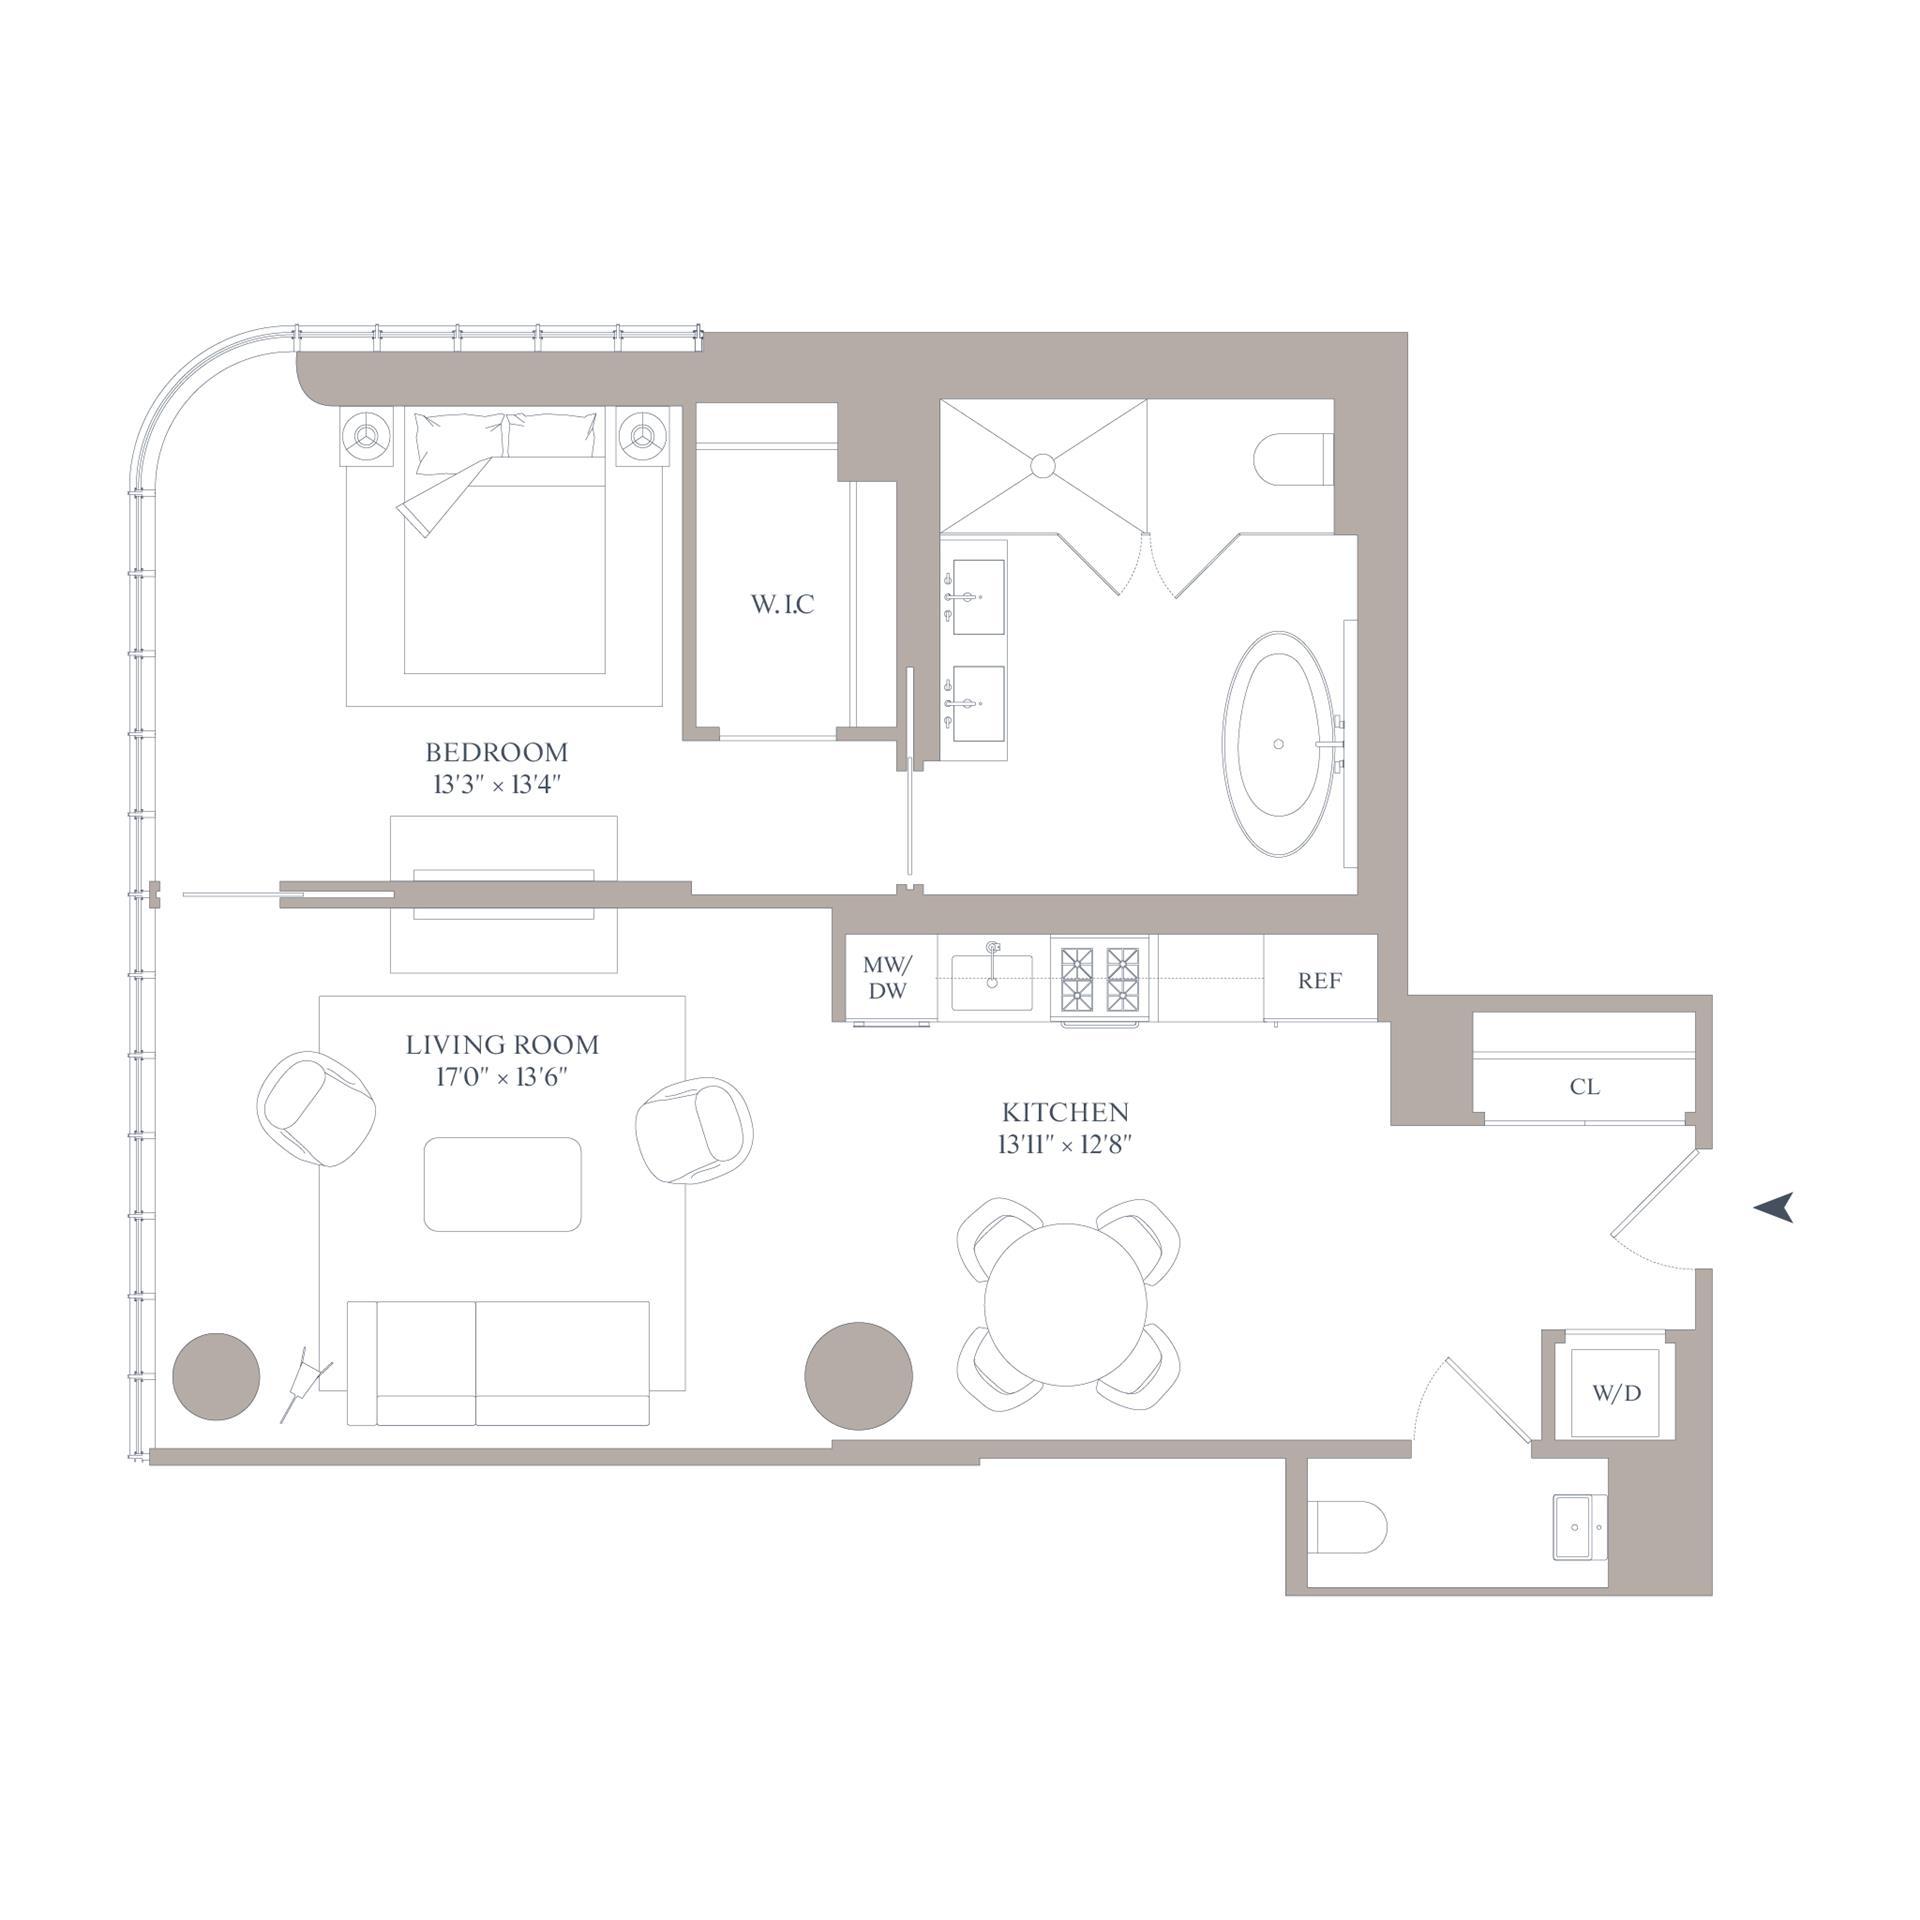 Floor plan of 565 Broome St, S9A - SoHo - Nolita, New York